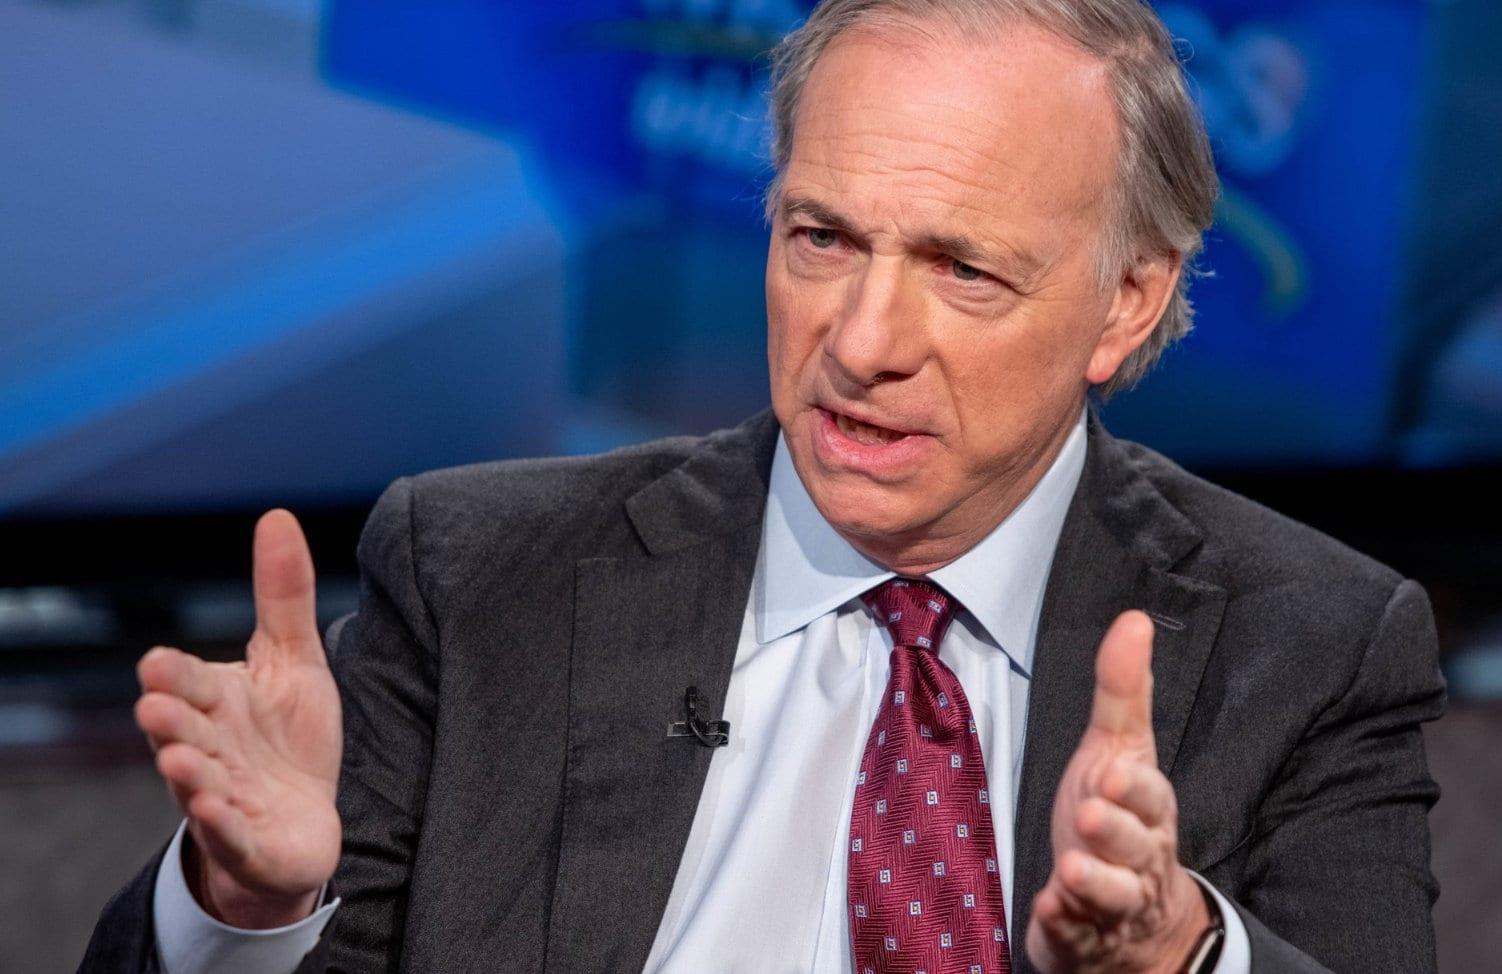 Hedgefund manager Ray Dalio's analysis, U.S. needs redistribution, Robert Steele, Herland Report